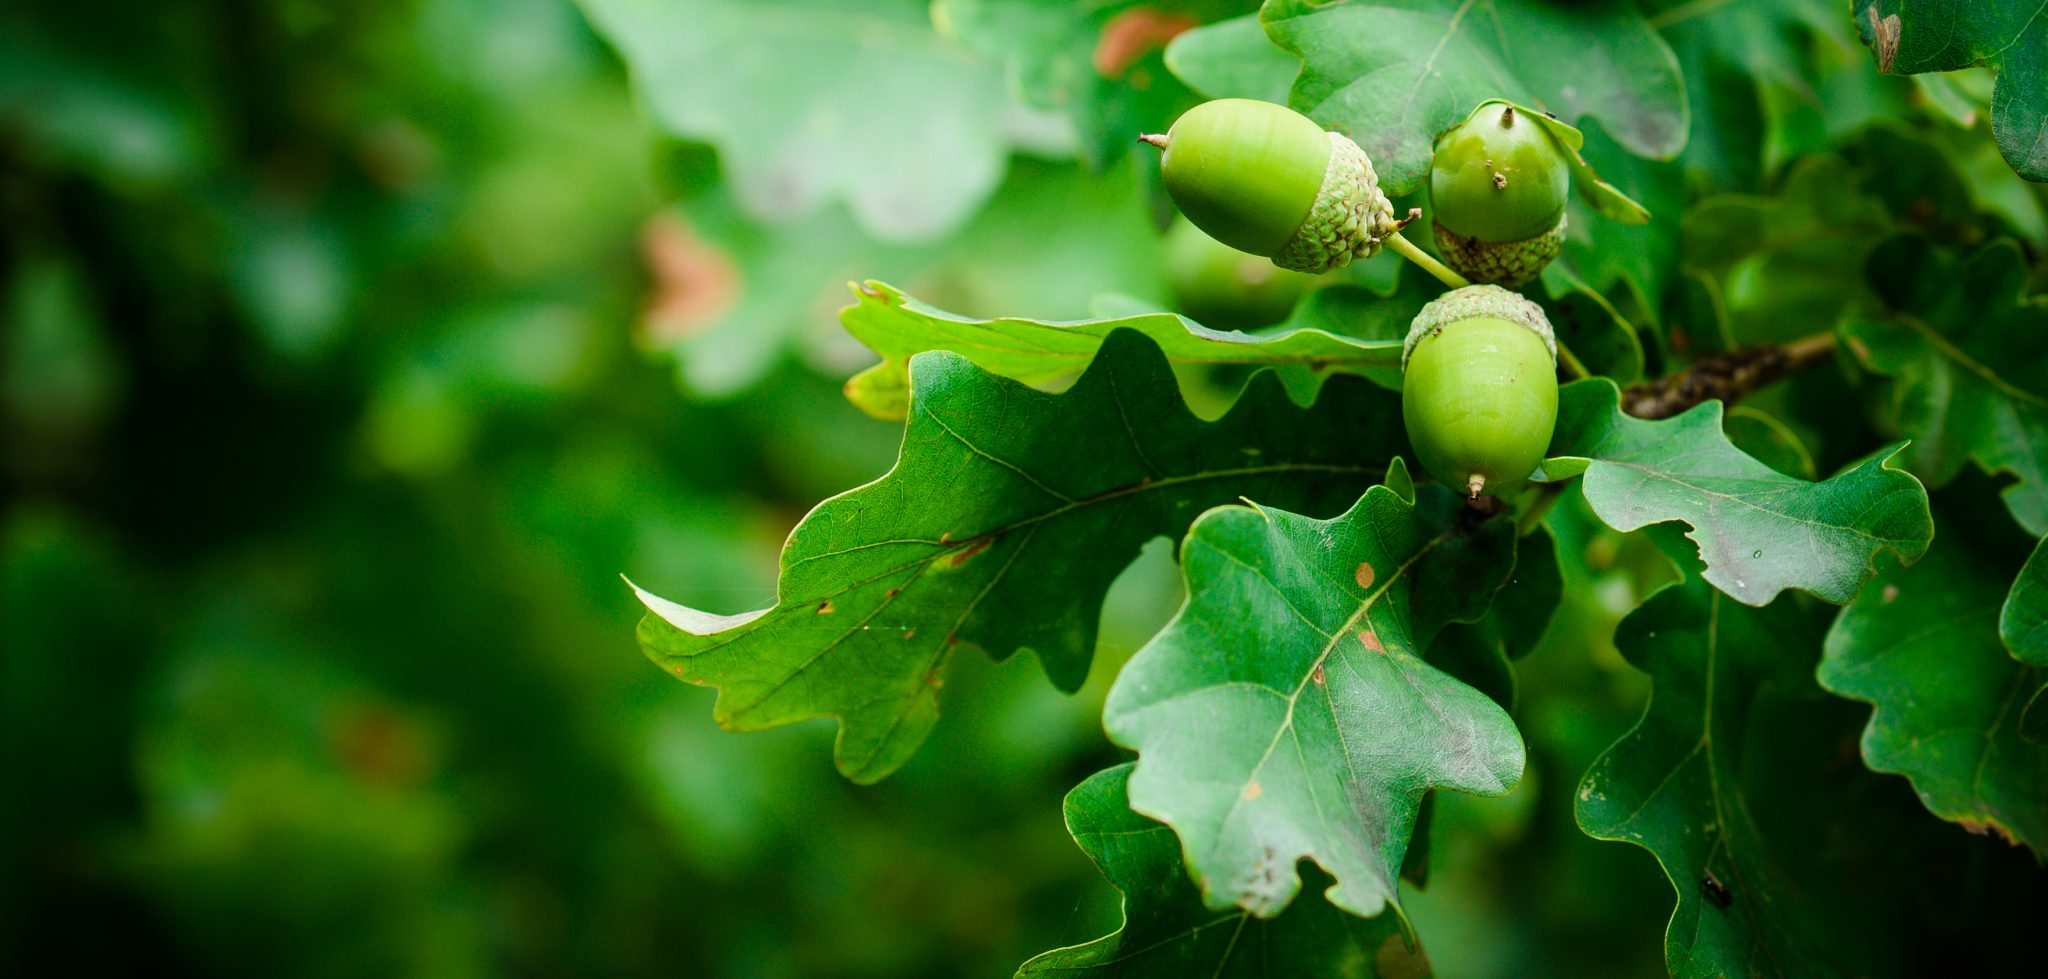 Oak trees with acorns